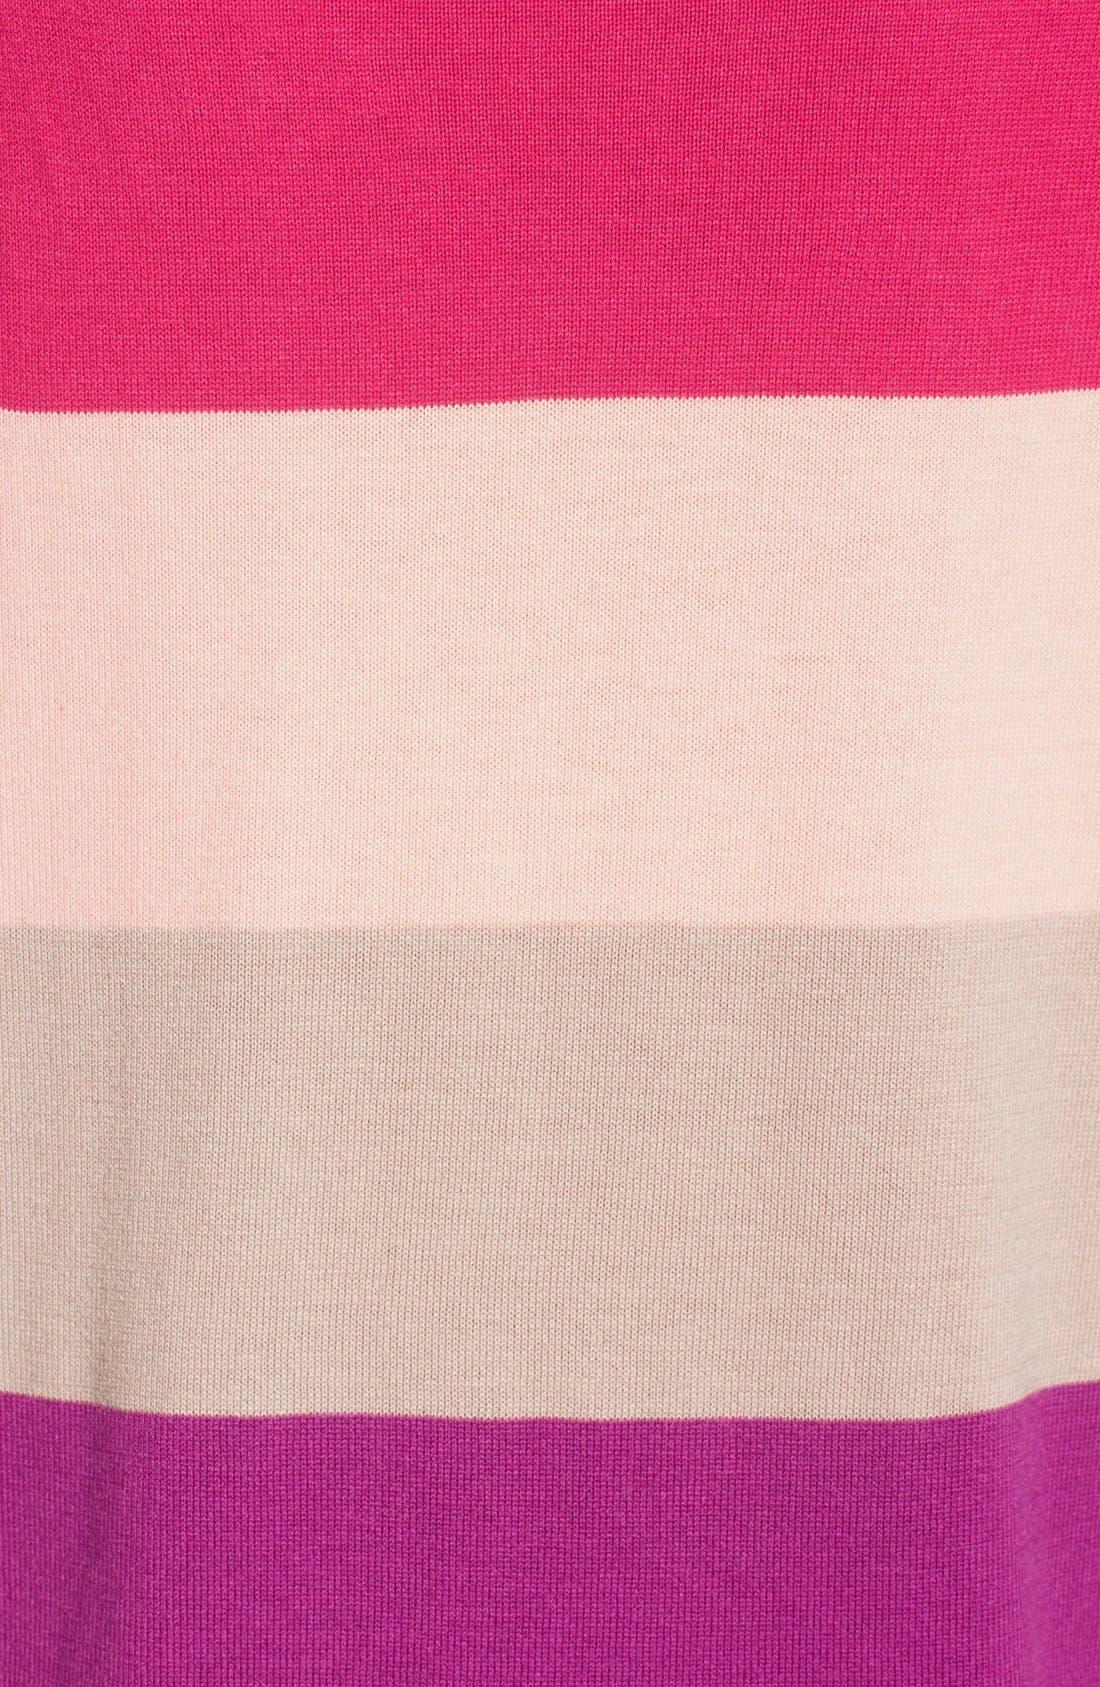 Alternate Image 5  - Caslon® Raglan Crewneck Sweater (Regular & Petite)